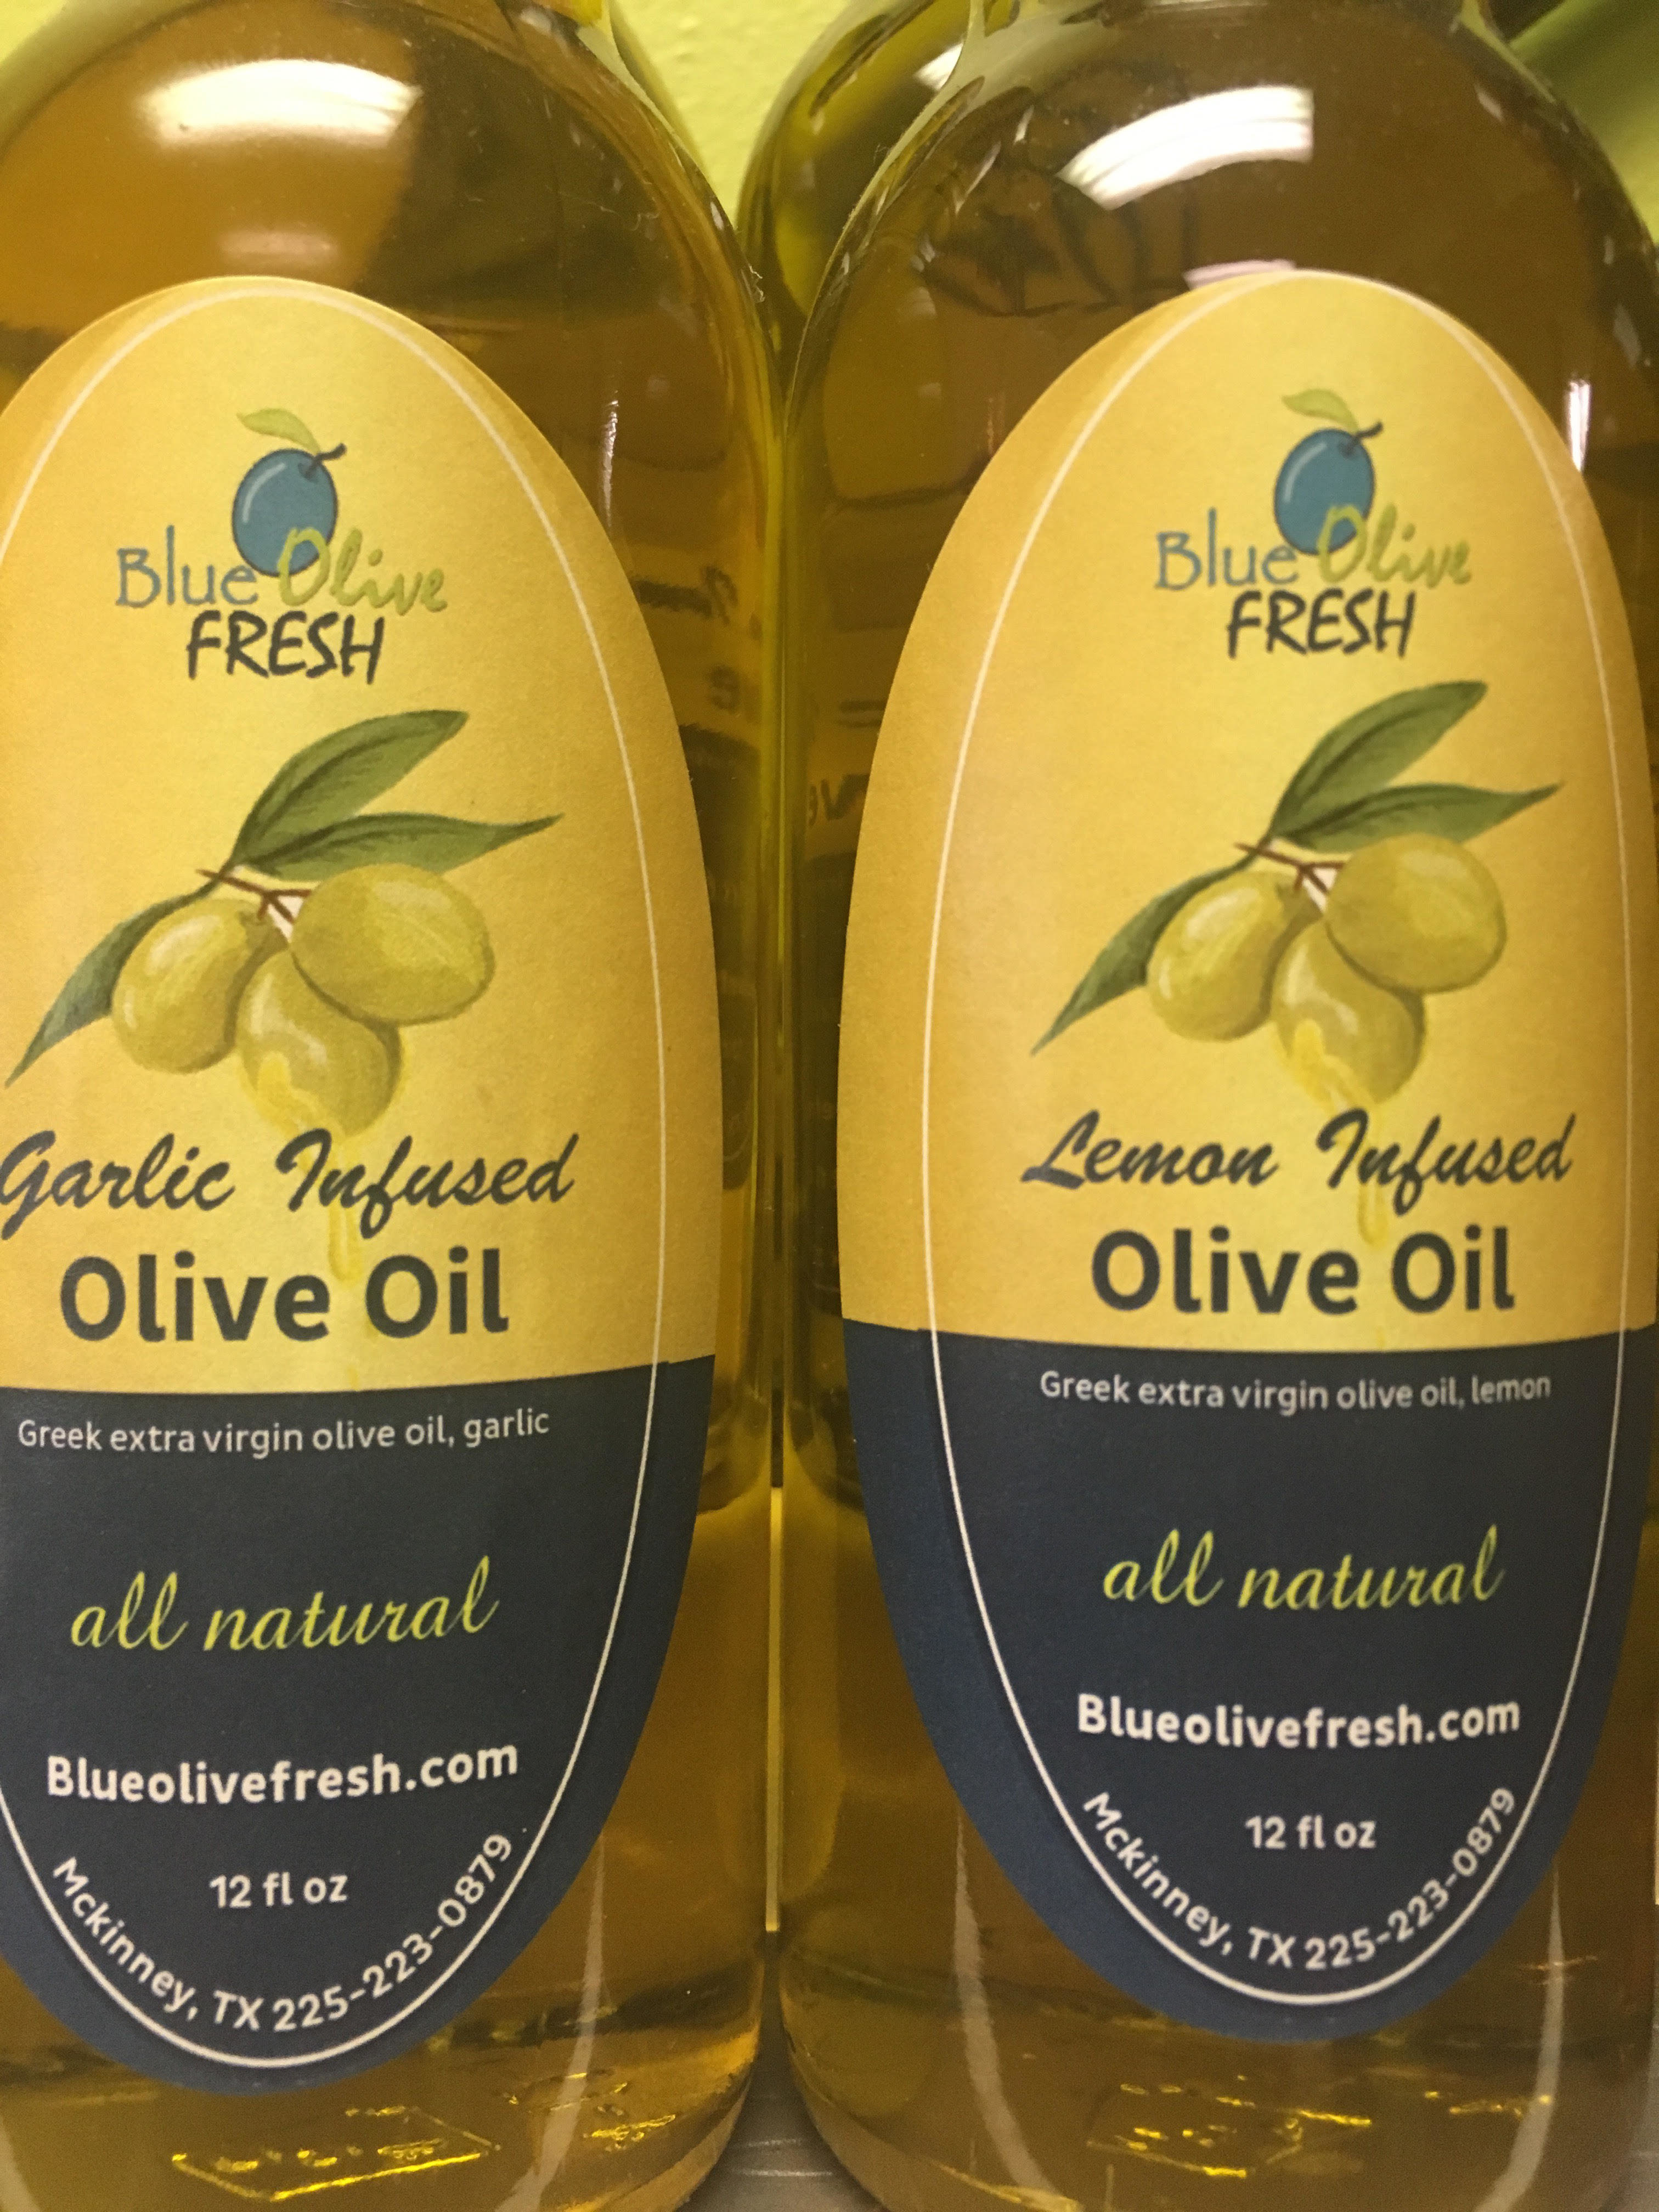 Garlic Infused Olive Oil 00009